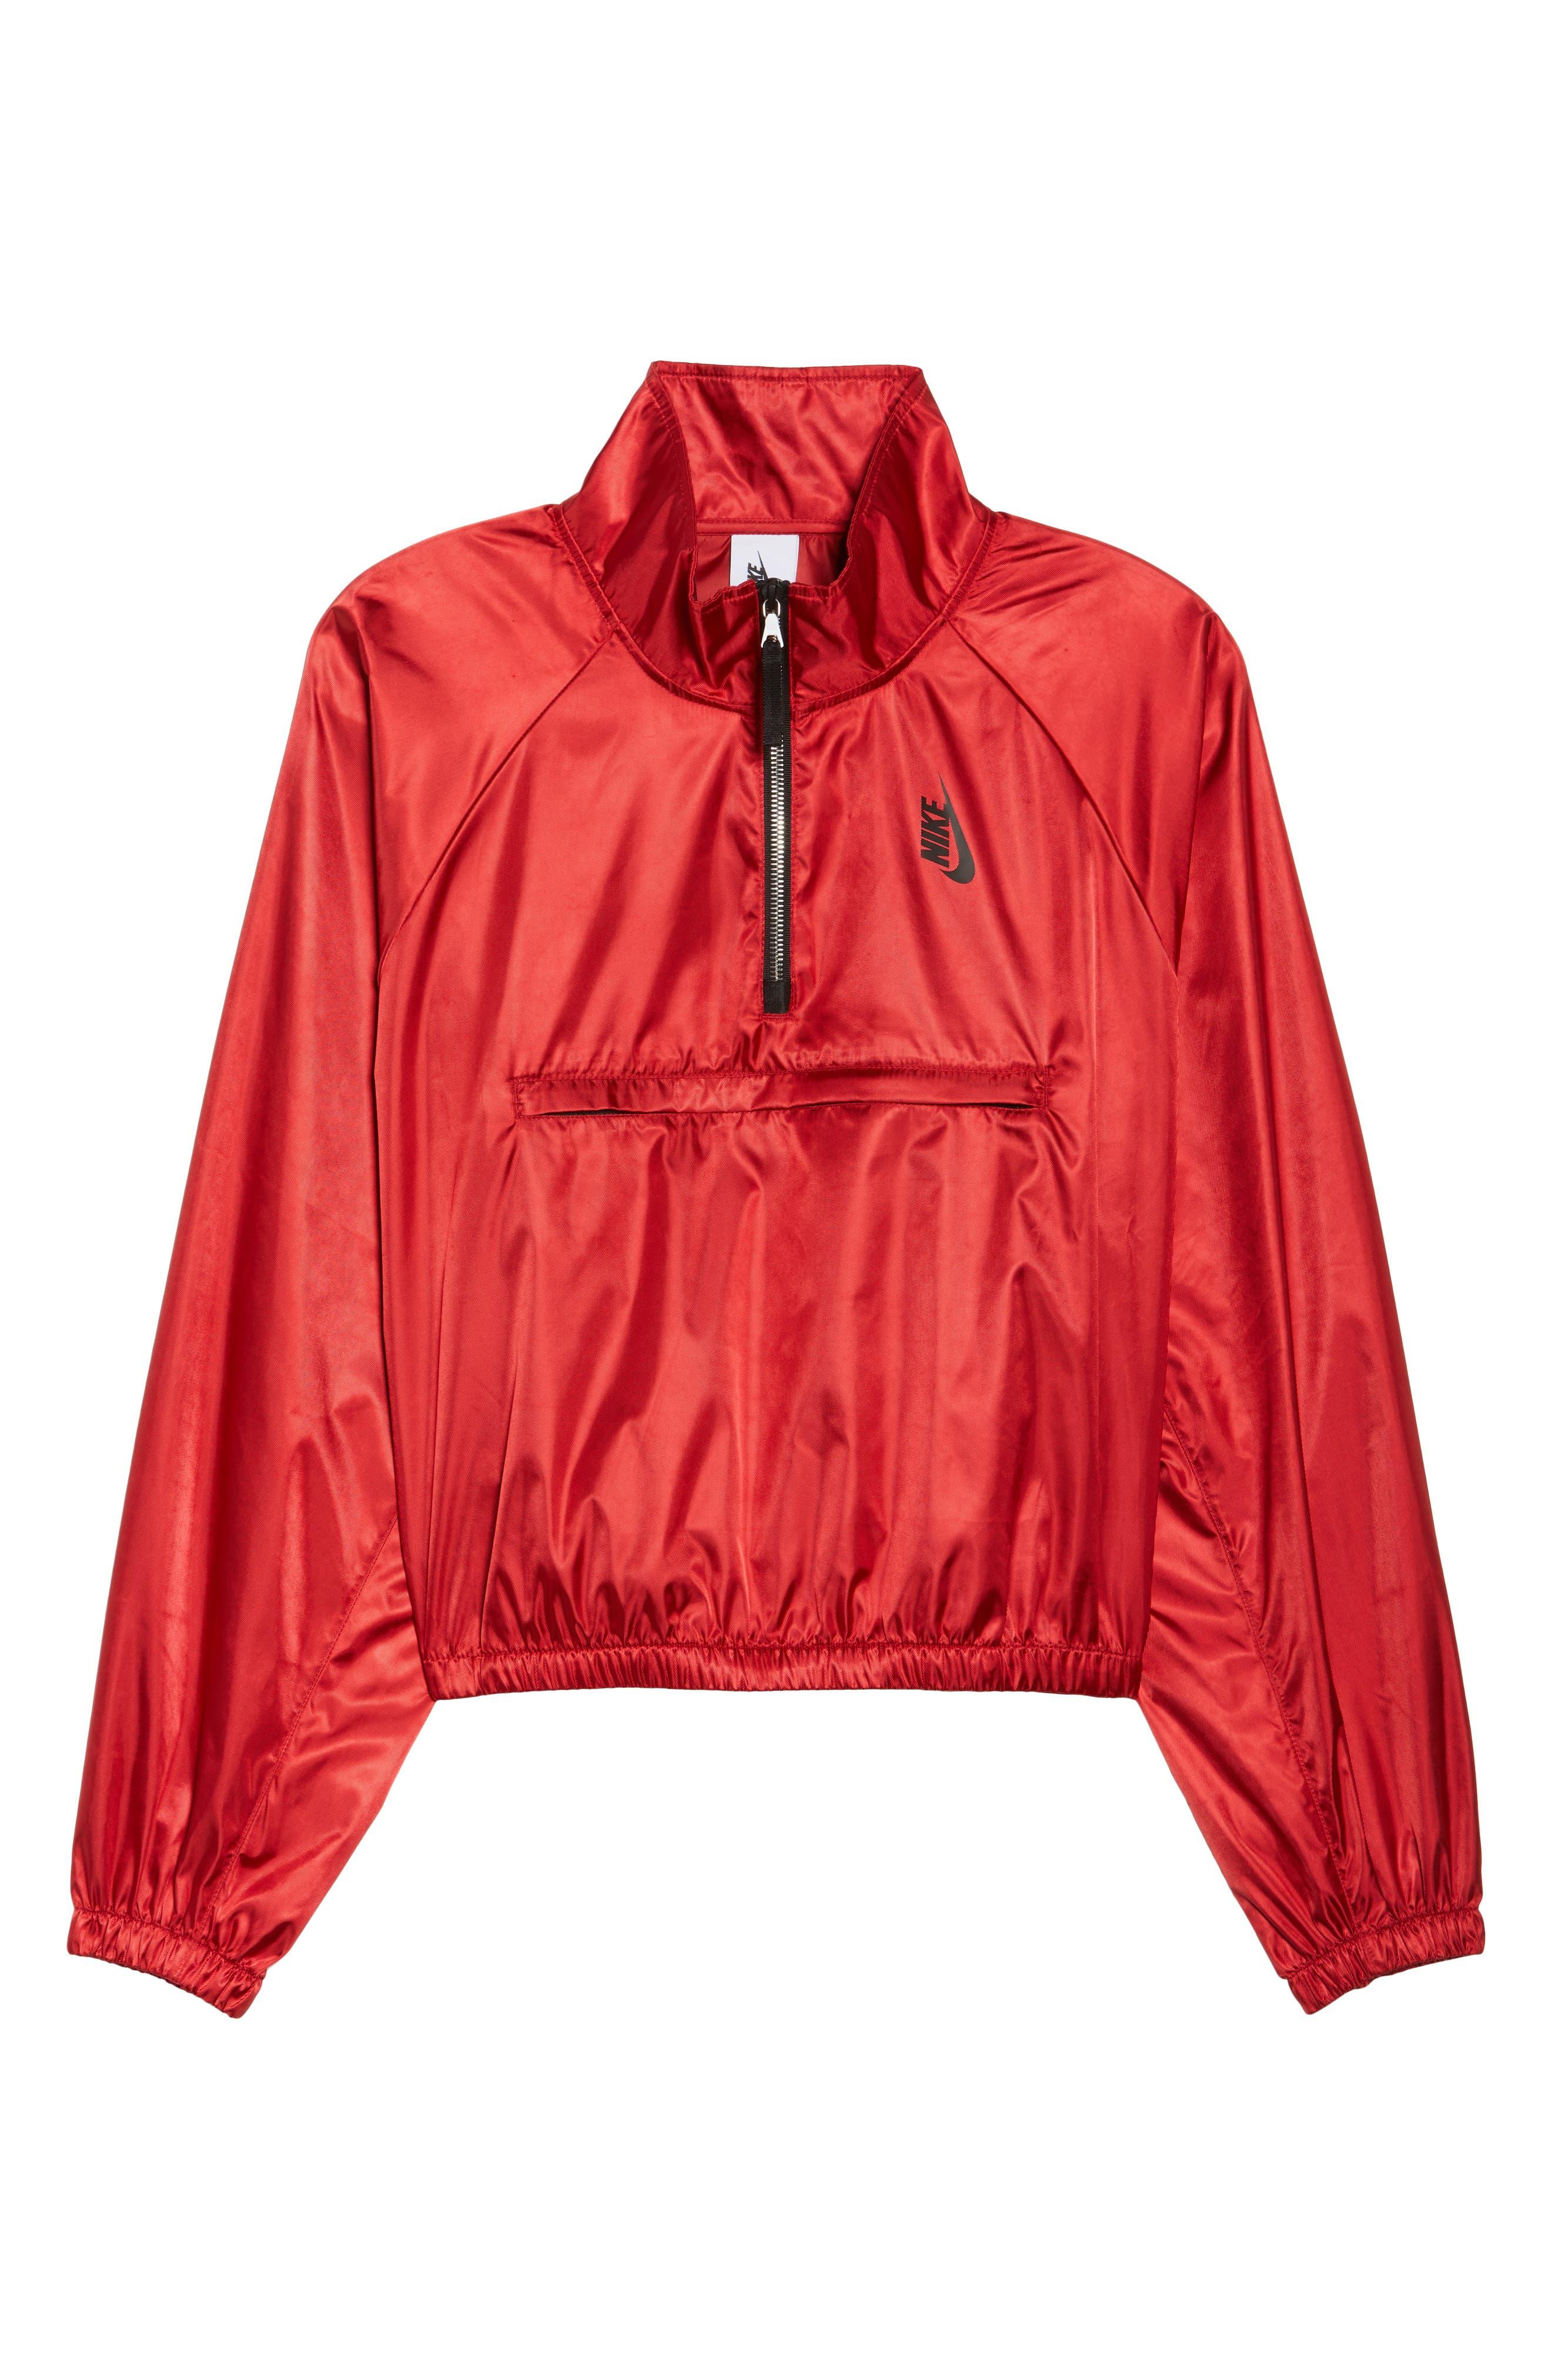 NikeLab Collection Satin Half Zip Top,                             Alternate thumbnail 8, color,                             Gym Red/ Black